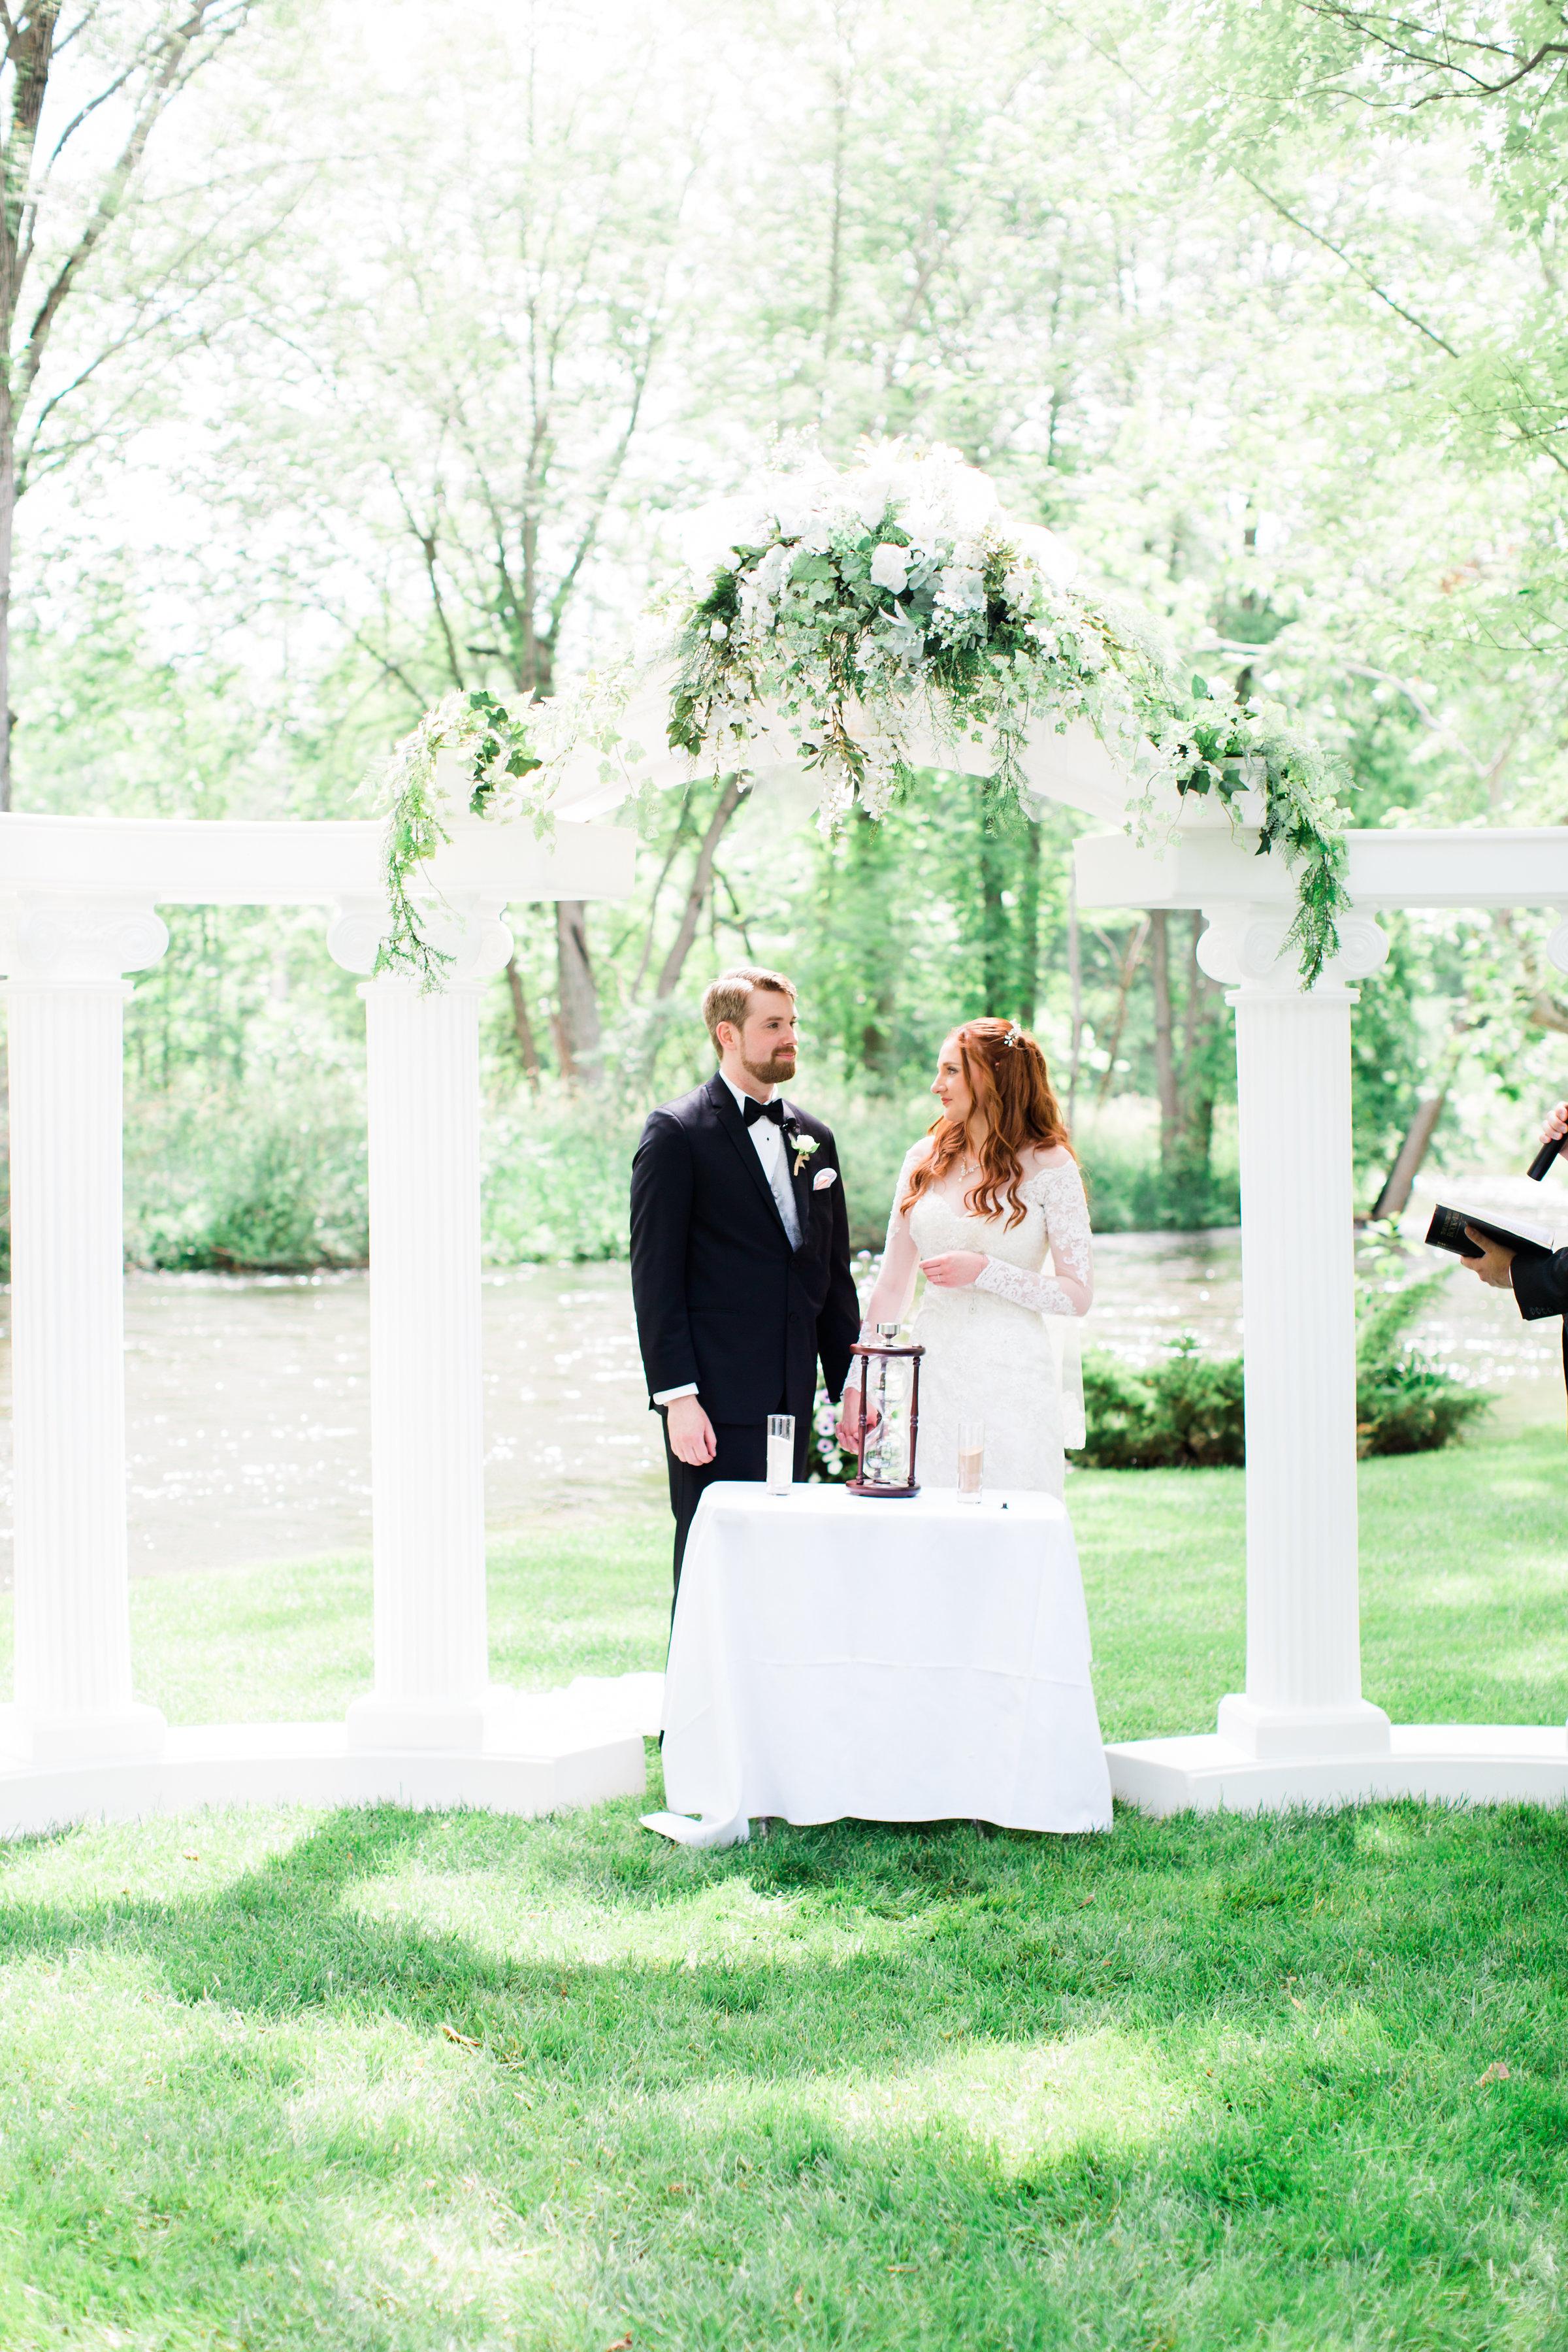 Conger+Wedding+Ceremony-99.jpg